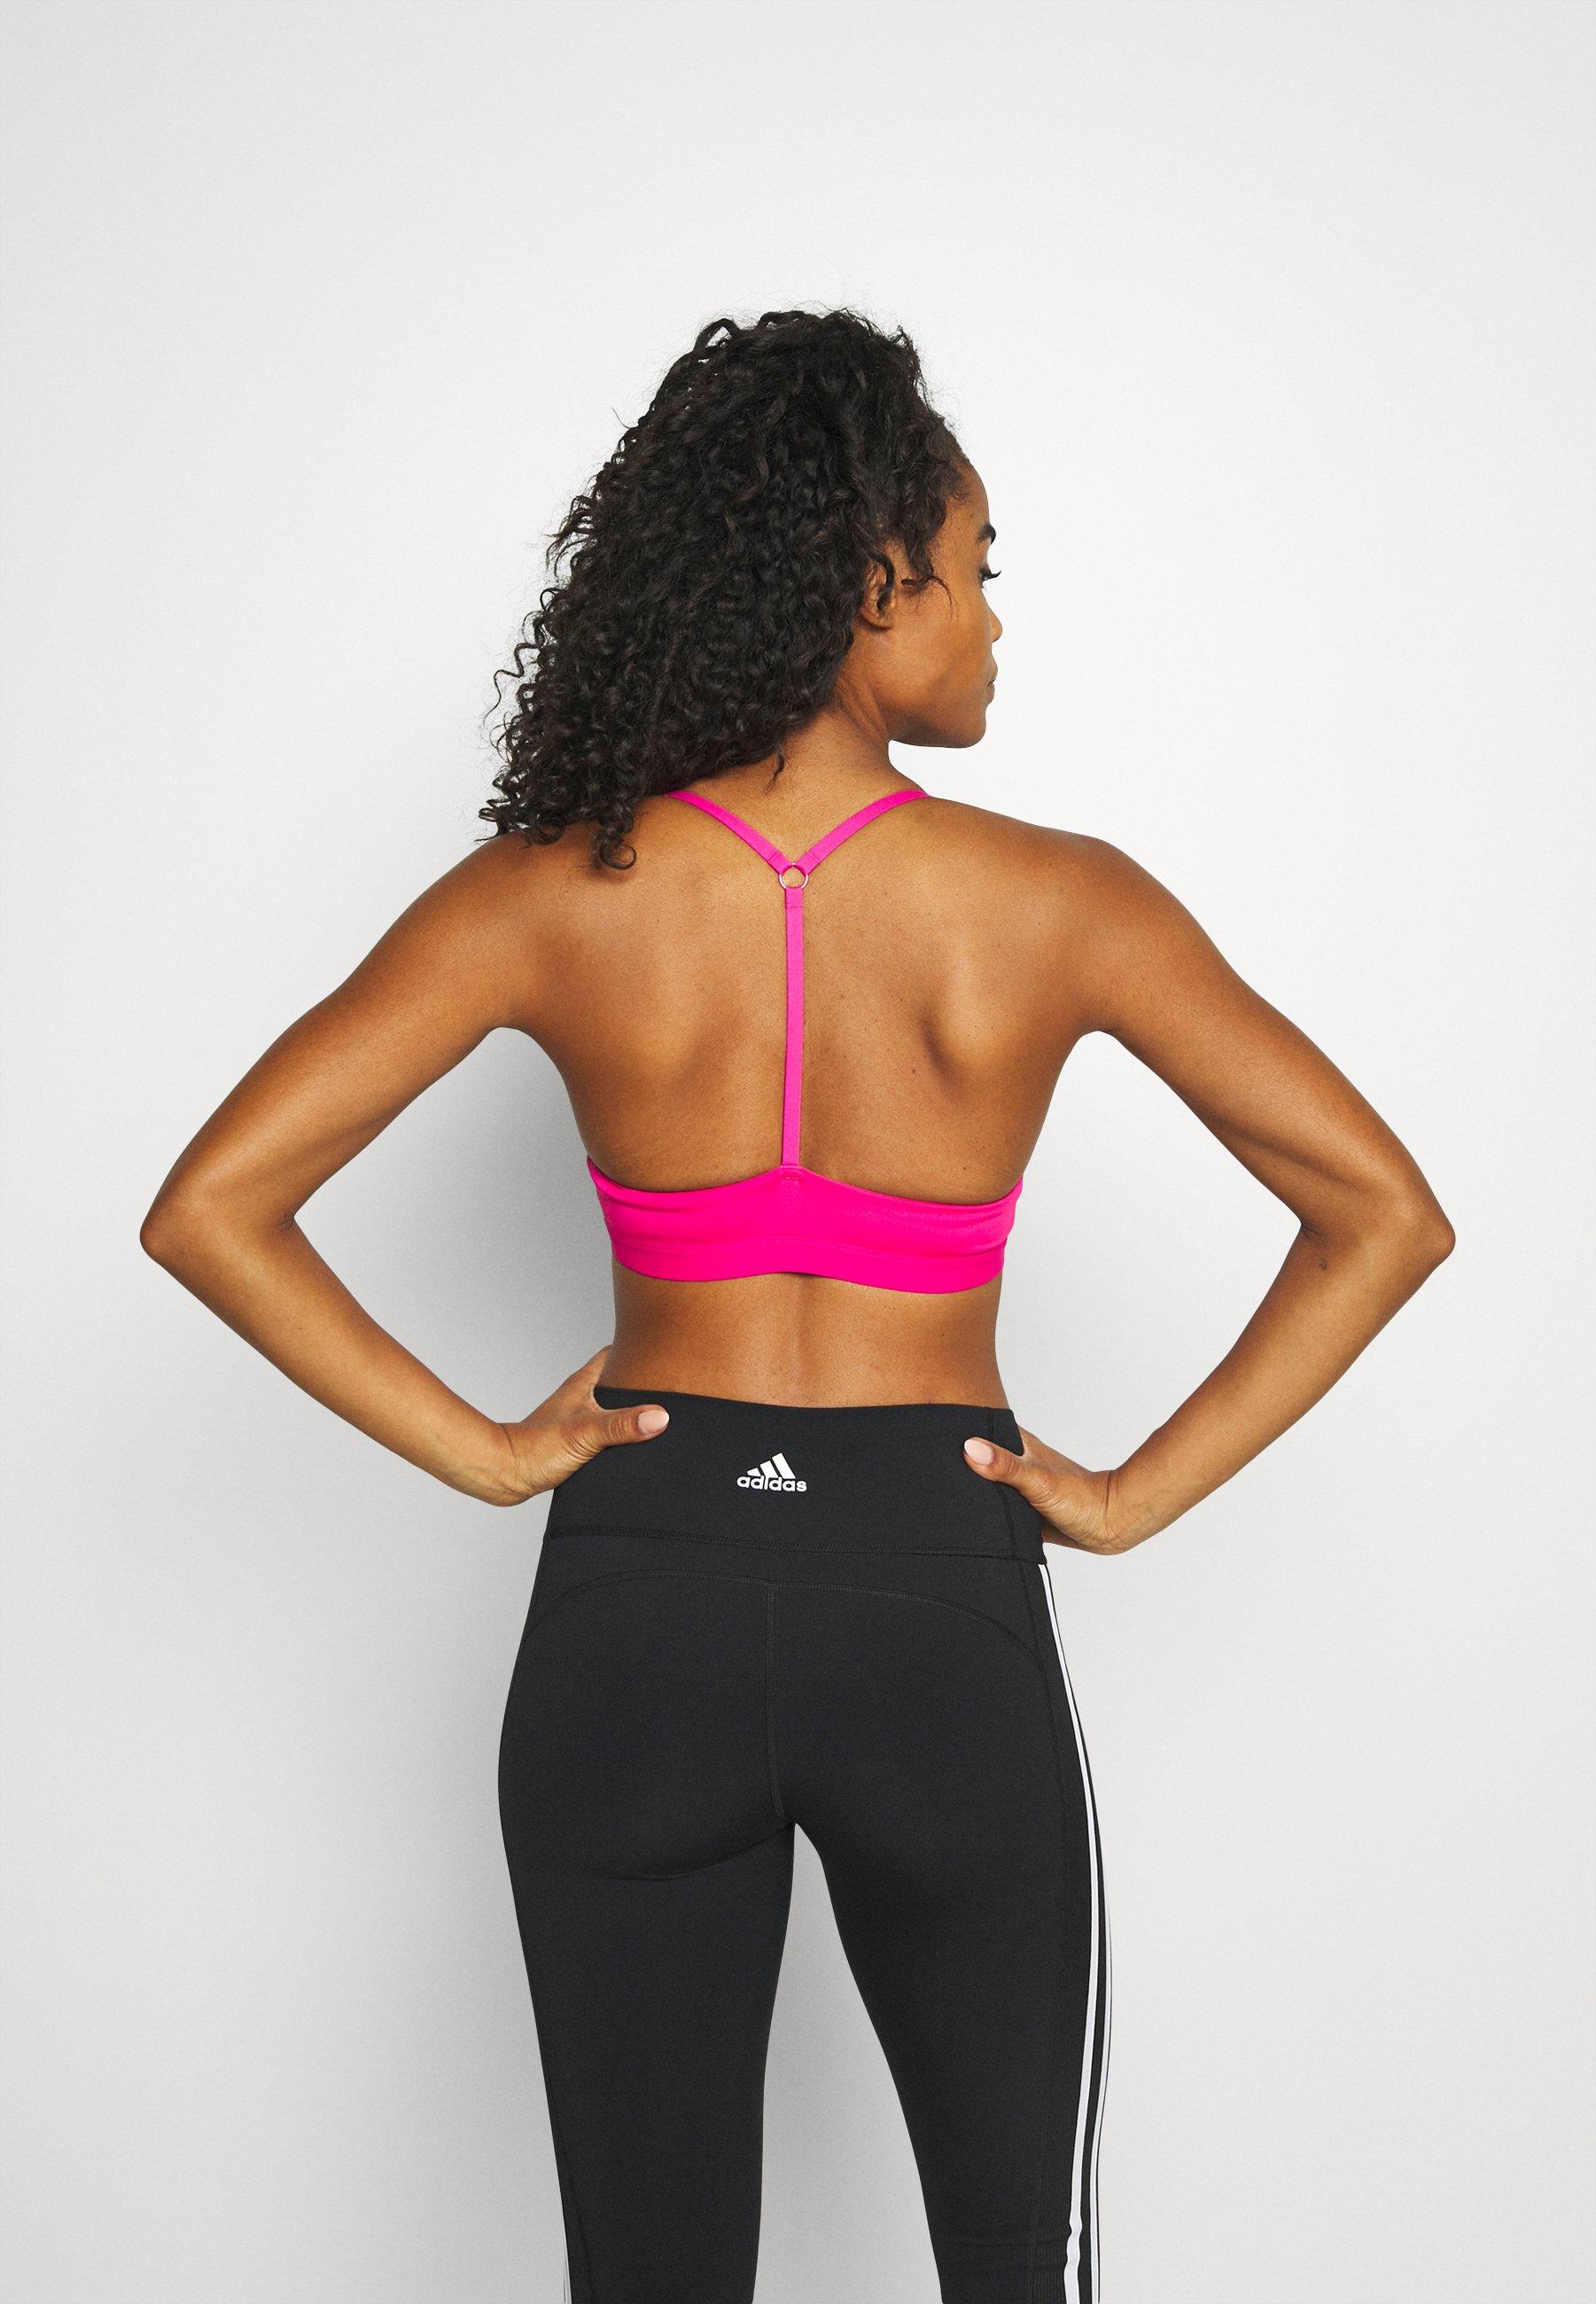 Women ALL ME BR DESIGNED4TRAINING AEROREADY COMPRESSION - Light support sports bra